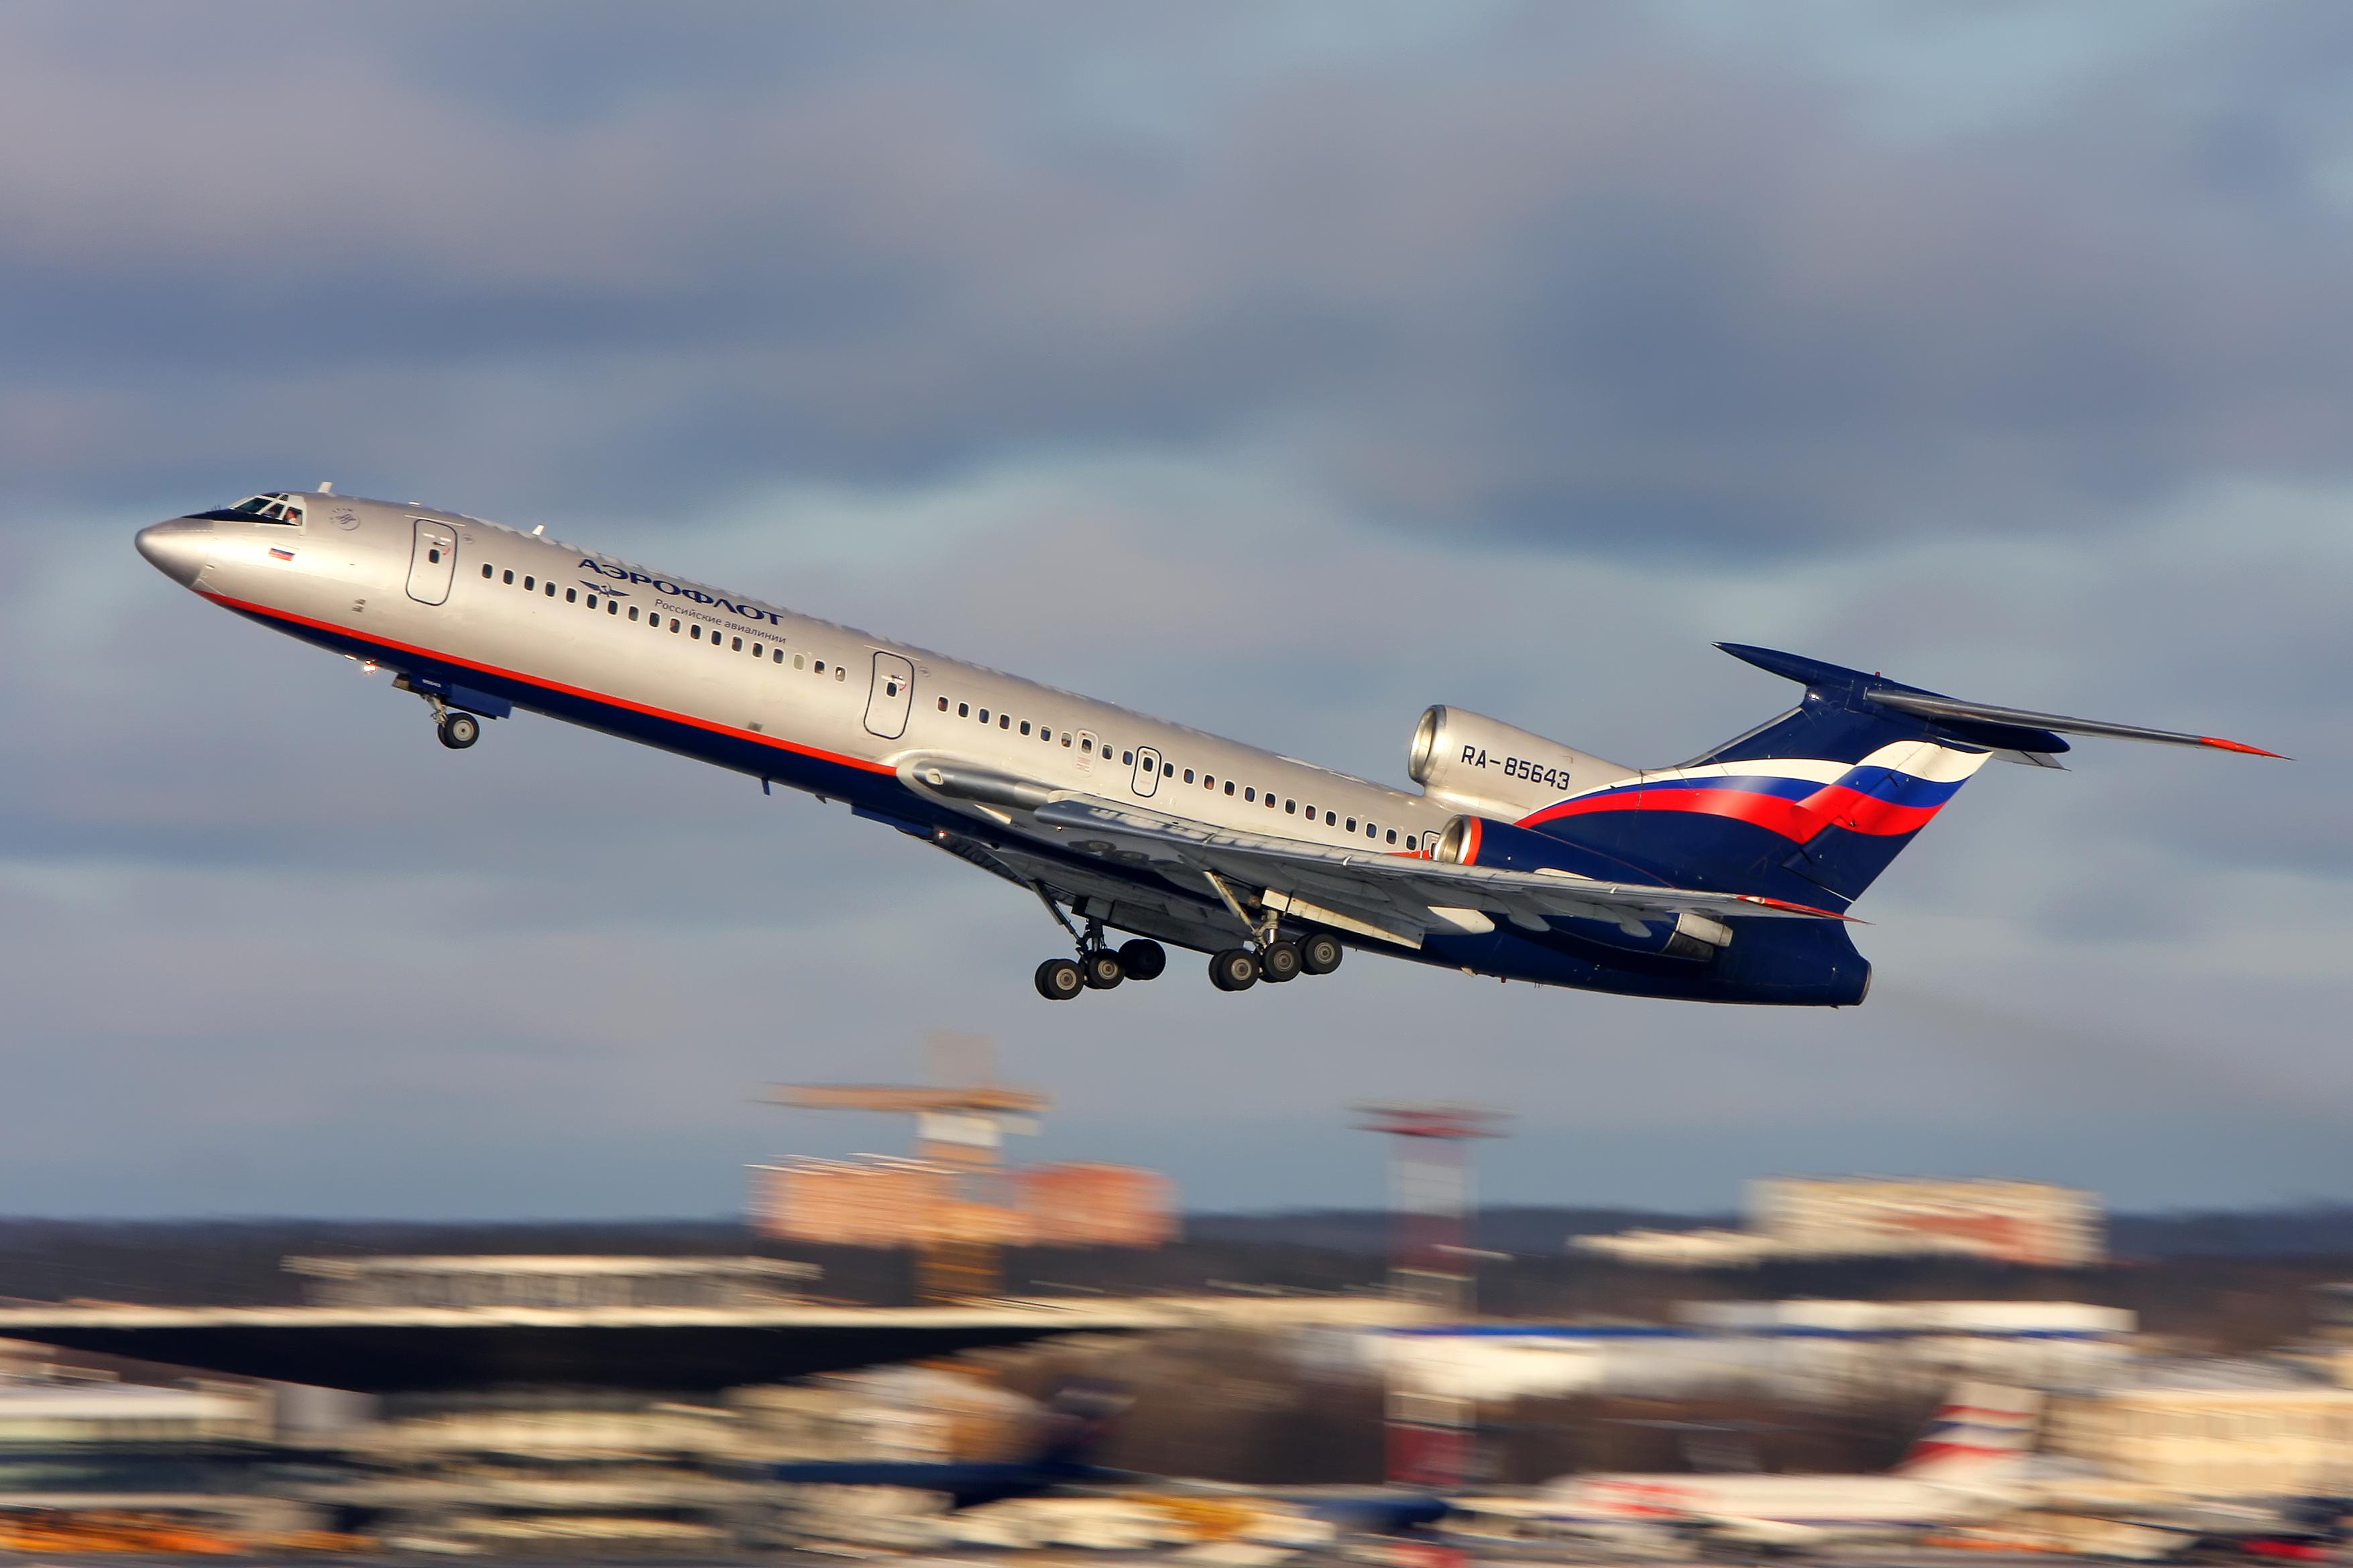 Aeroflot_Tupolev_Tu-154M_RA-85643_Mishin-1.jpg